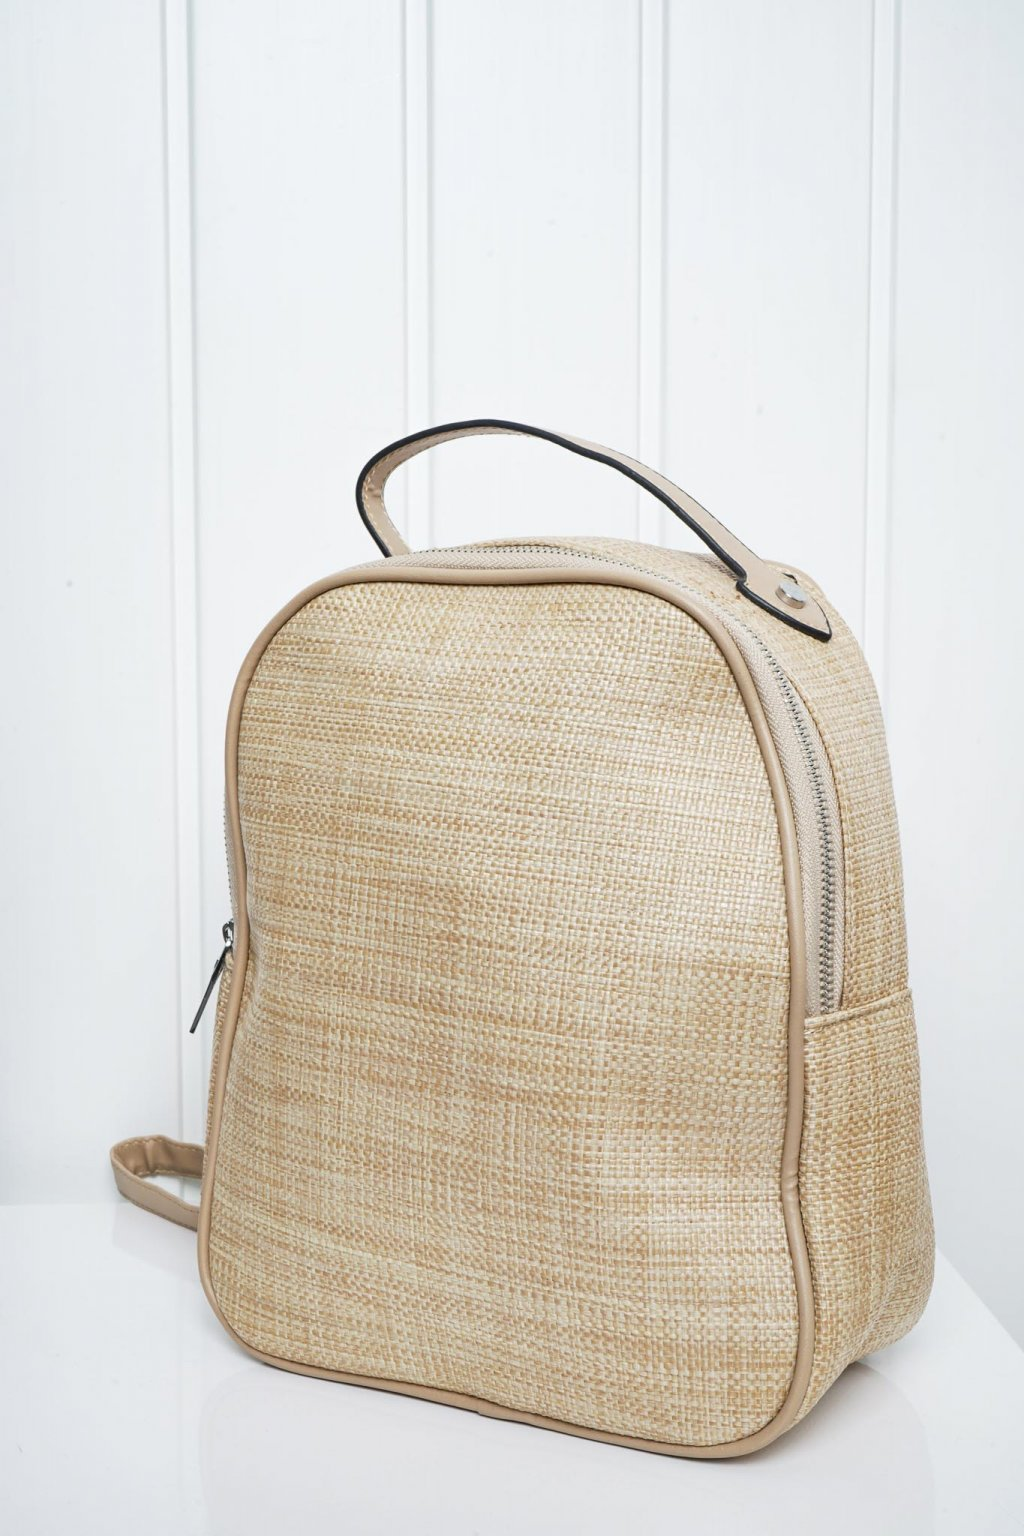 Kabelka, crossbody, ruksak, shopping bag, shopperka, 414